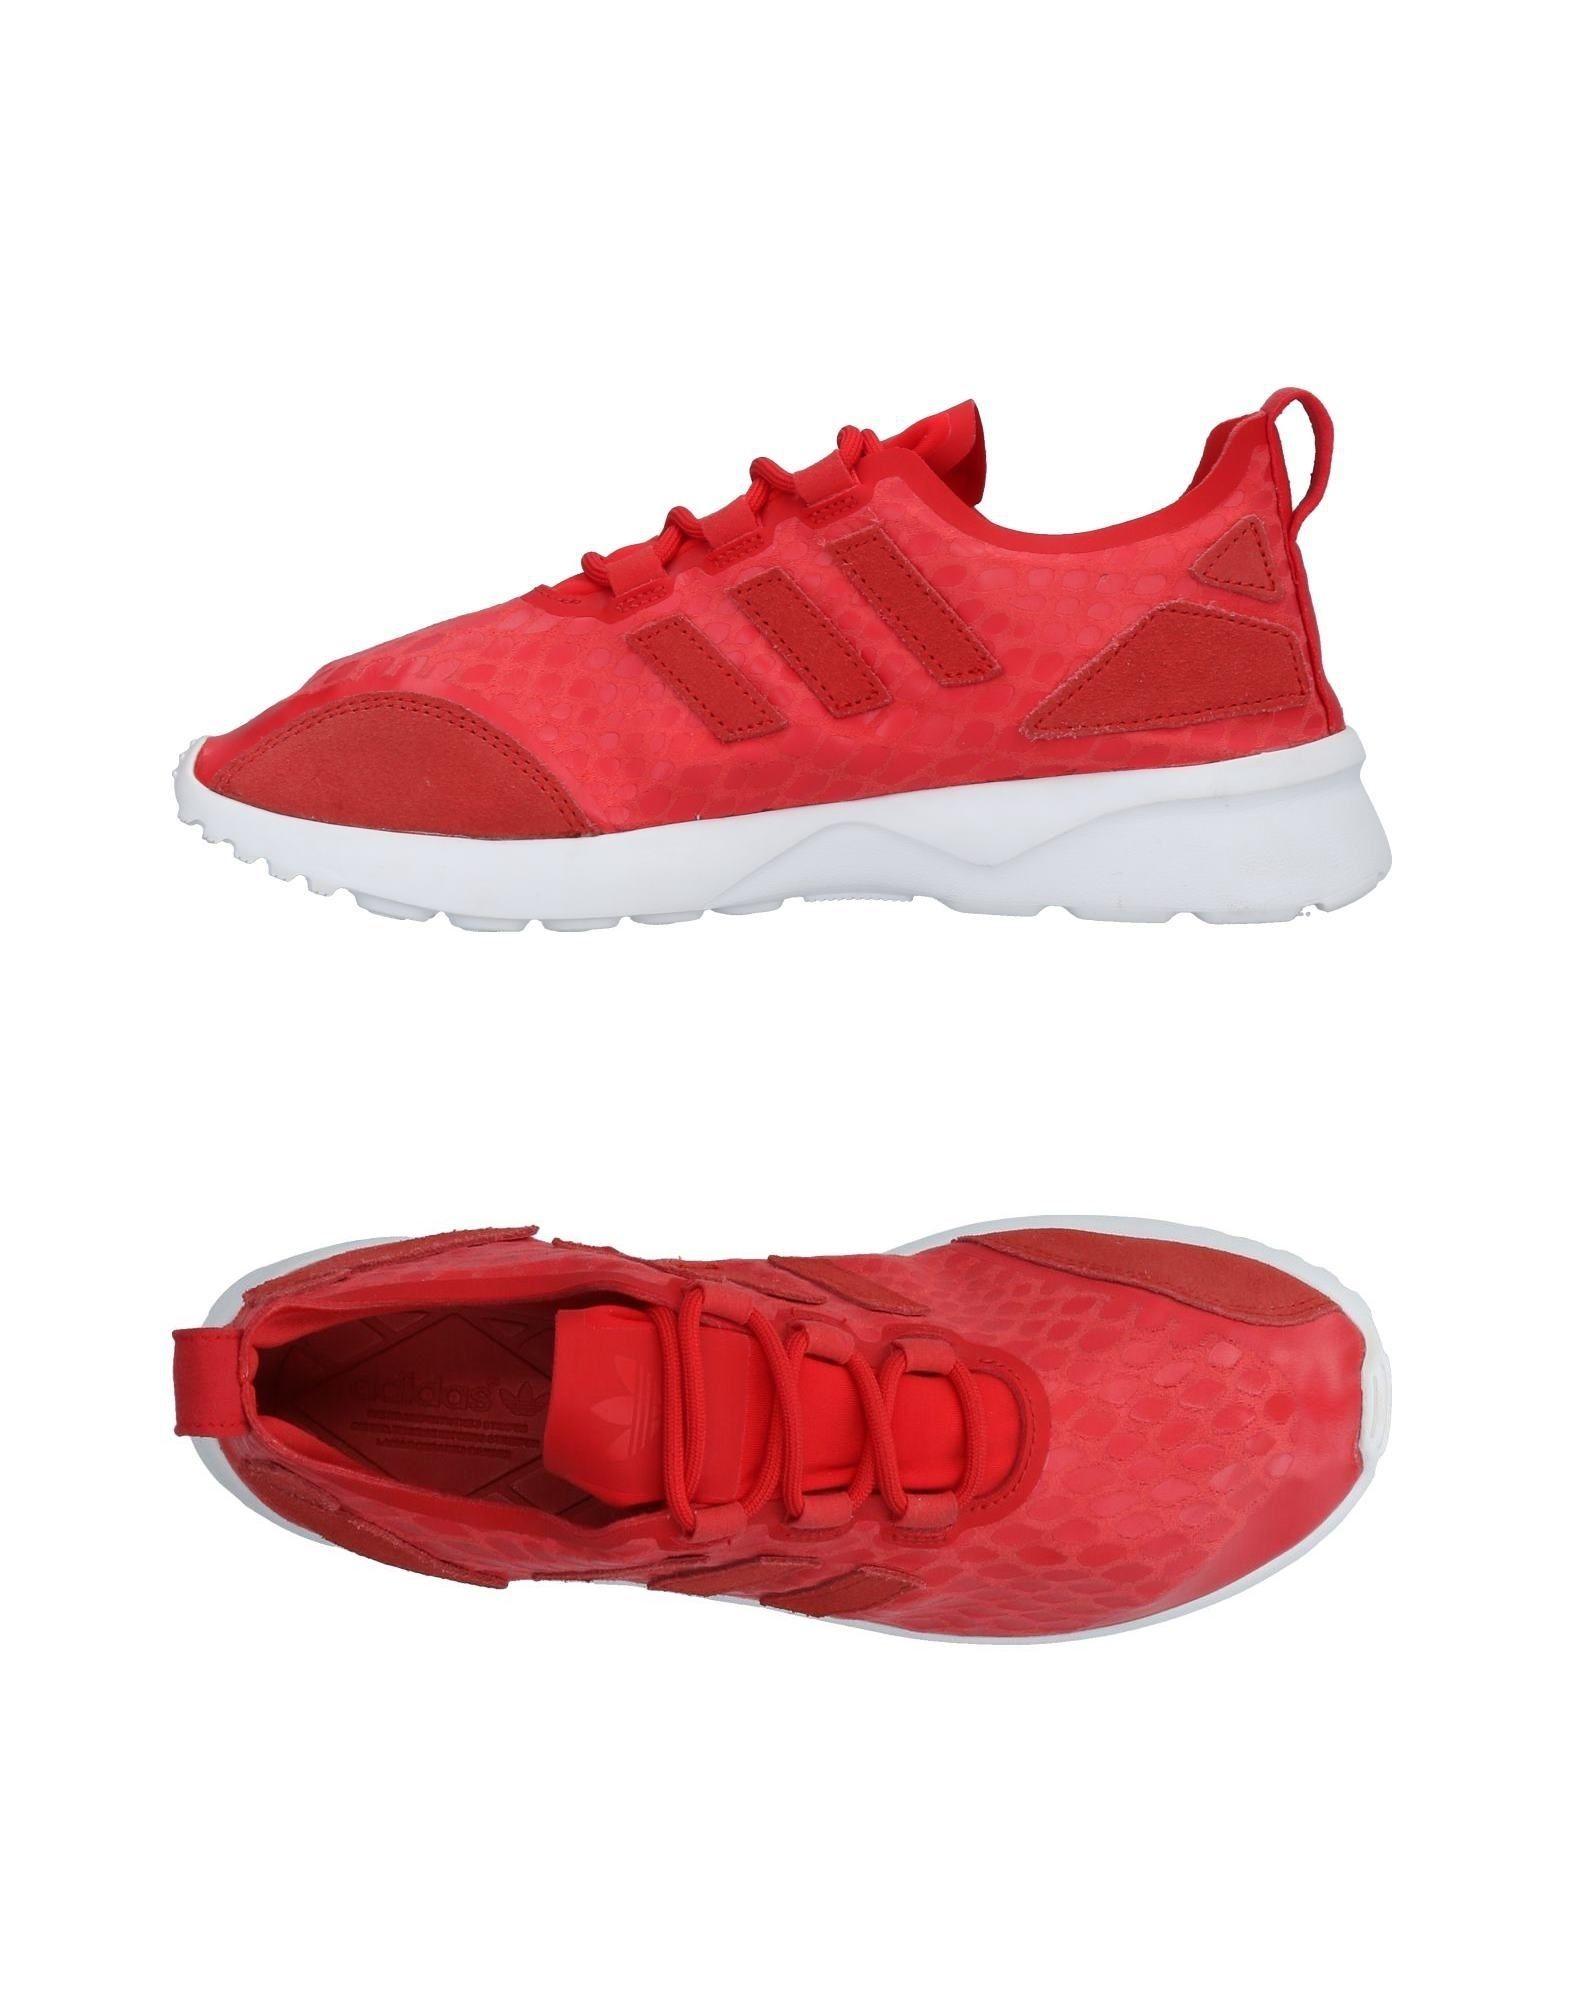 Adidas Originals Sneakers 11486374CH Damen  11486374CH Sneakers Neue Schuhe bdc364